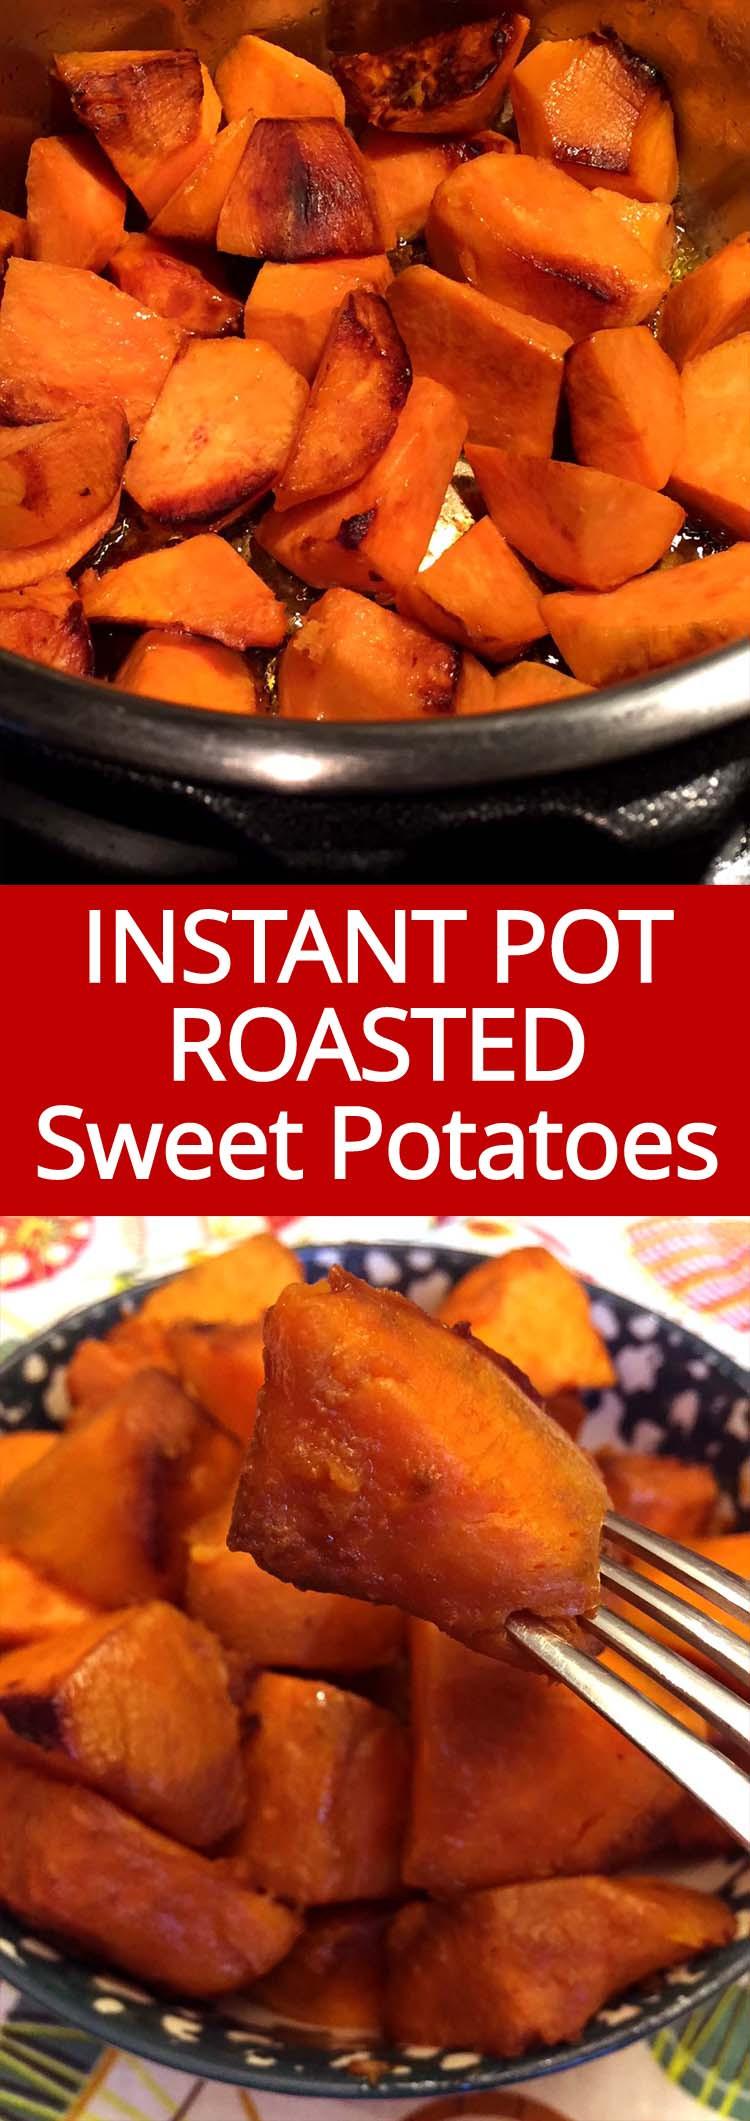 Instant Pot Baked Sweet Potato  Instant Pot Roasted Sweet Potatoes Recipe – Melanie Cooks